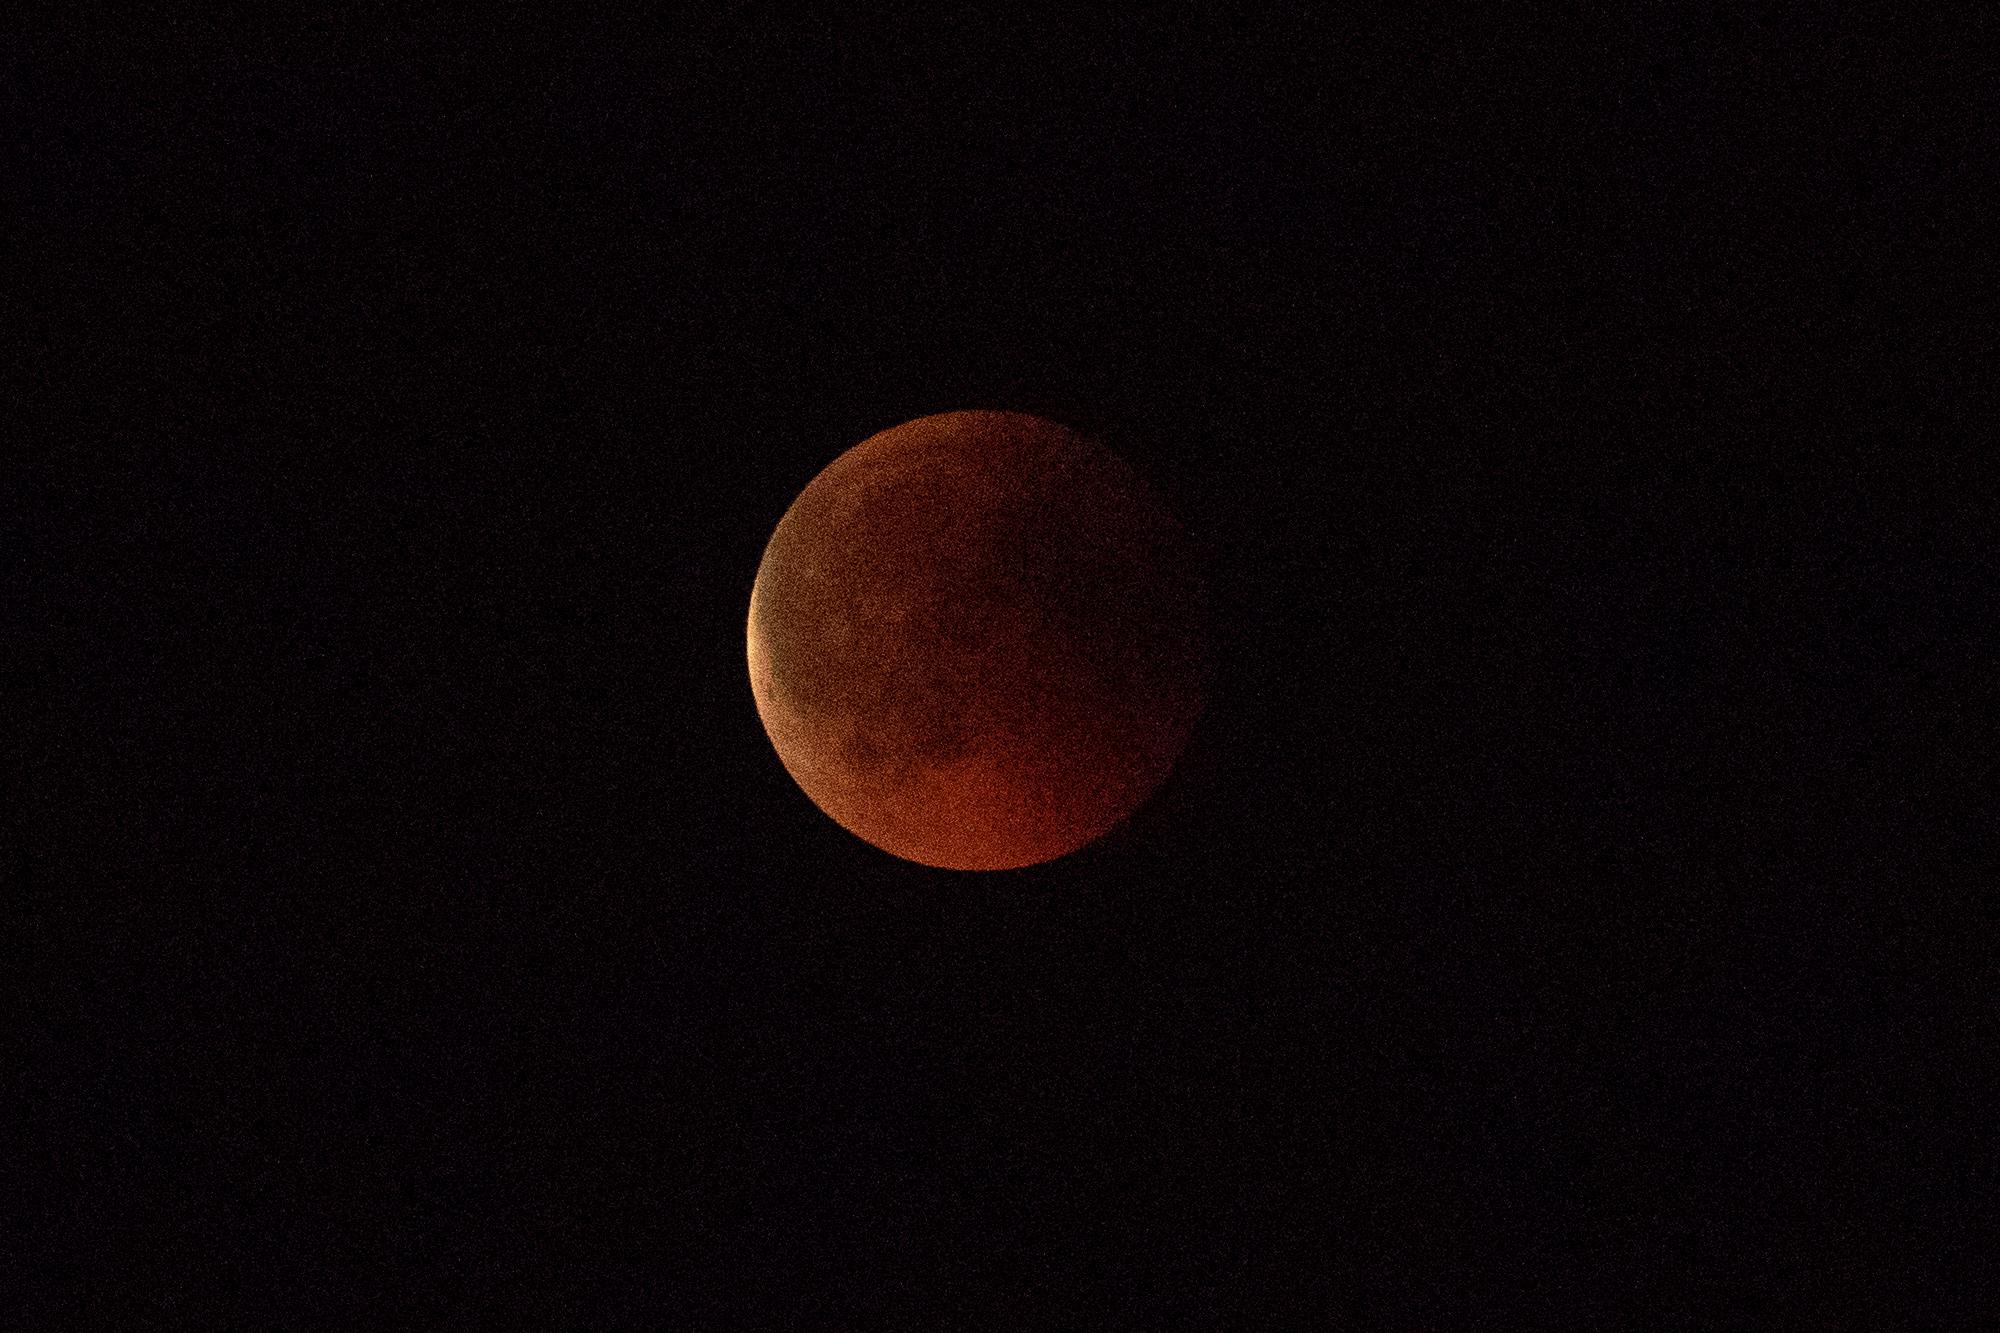 LunarEclipseWeb